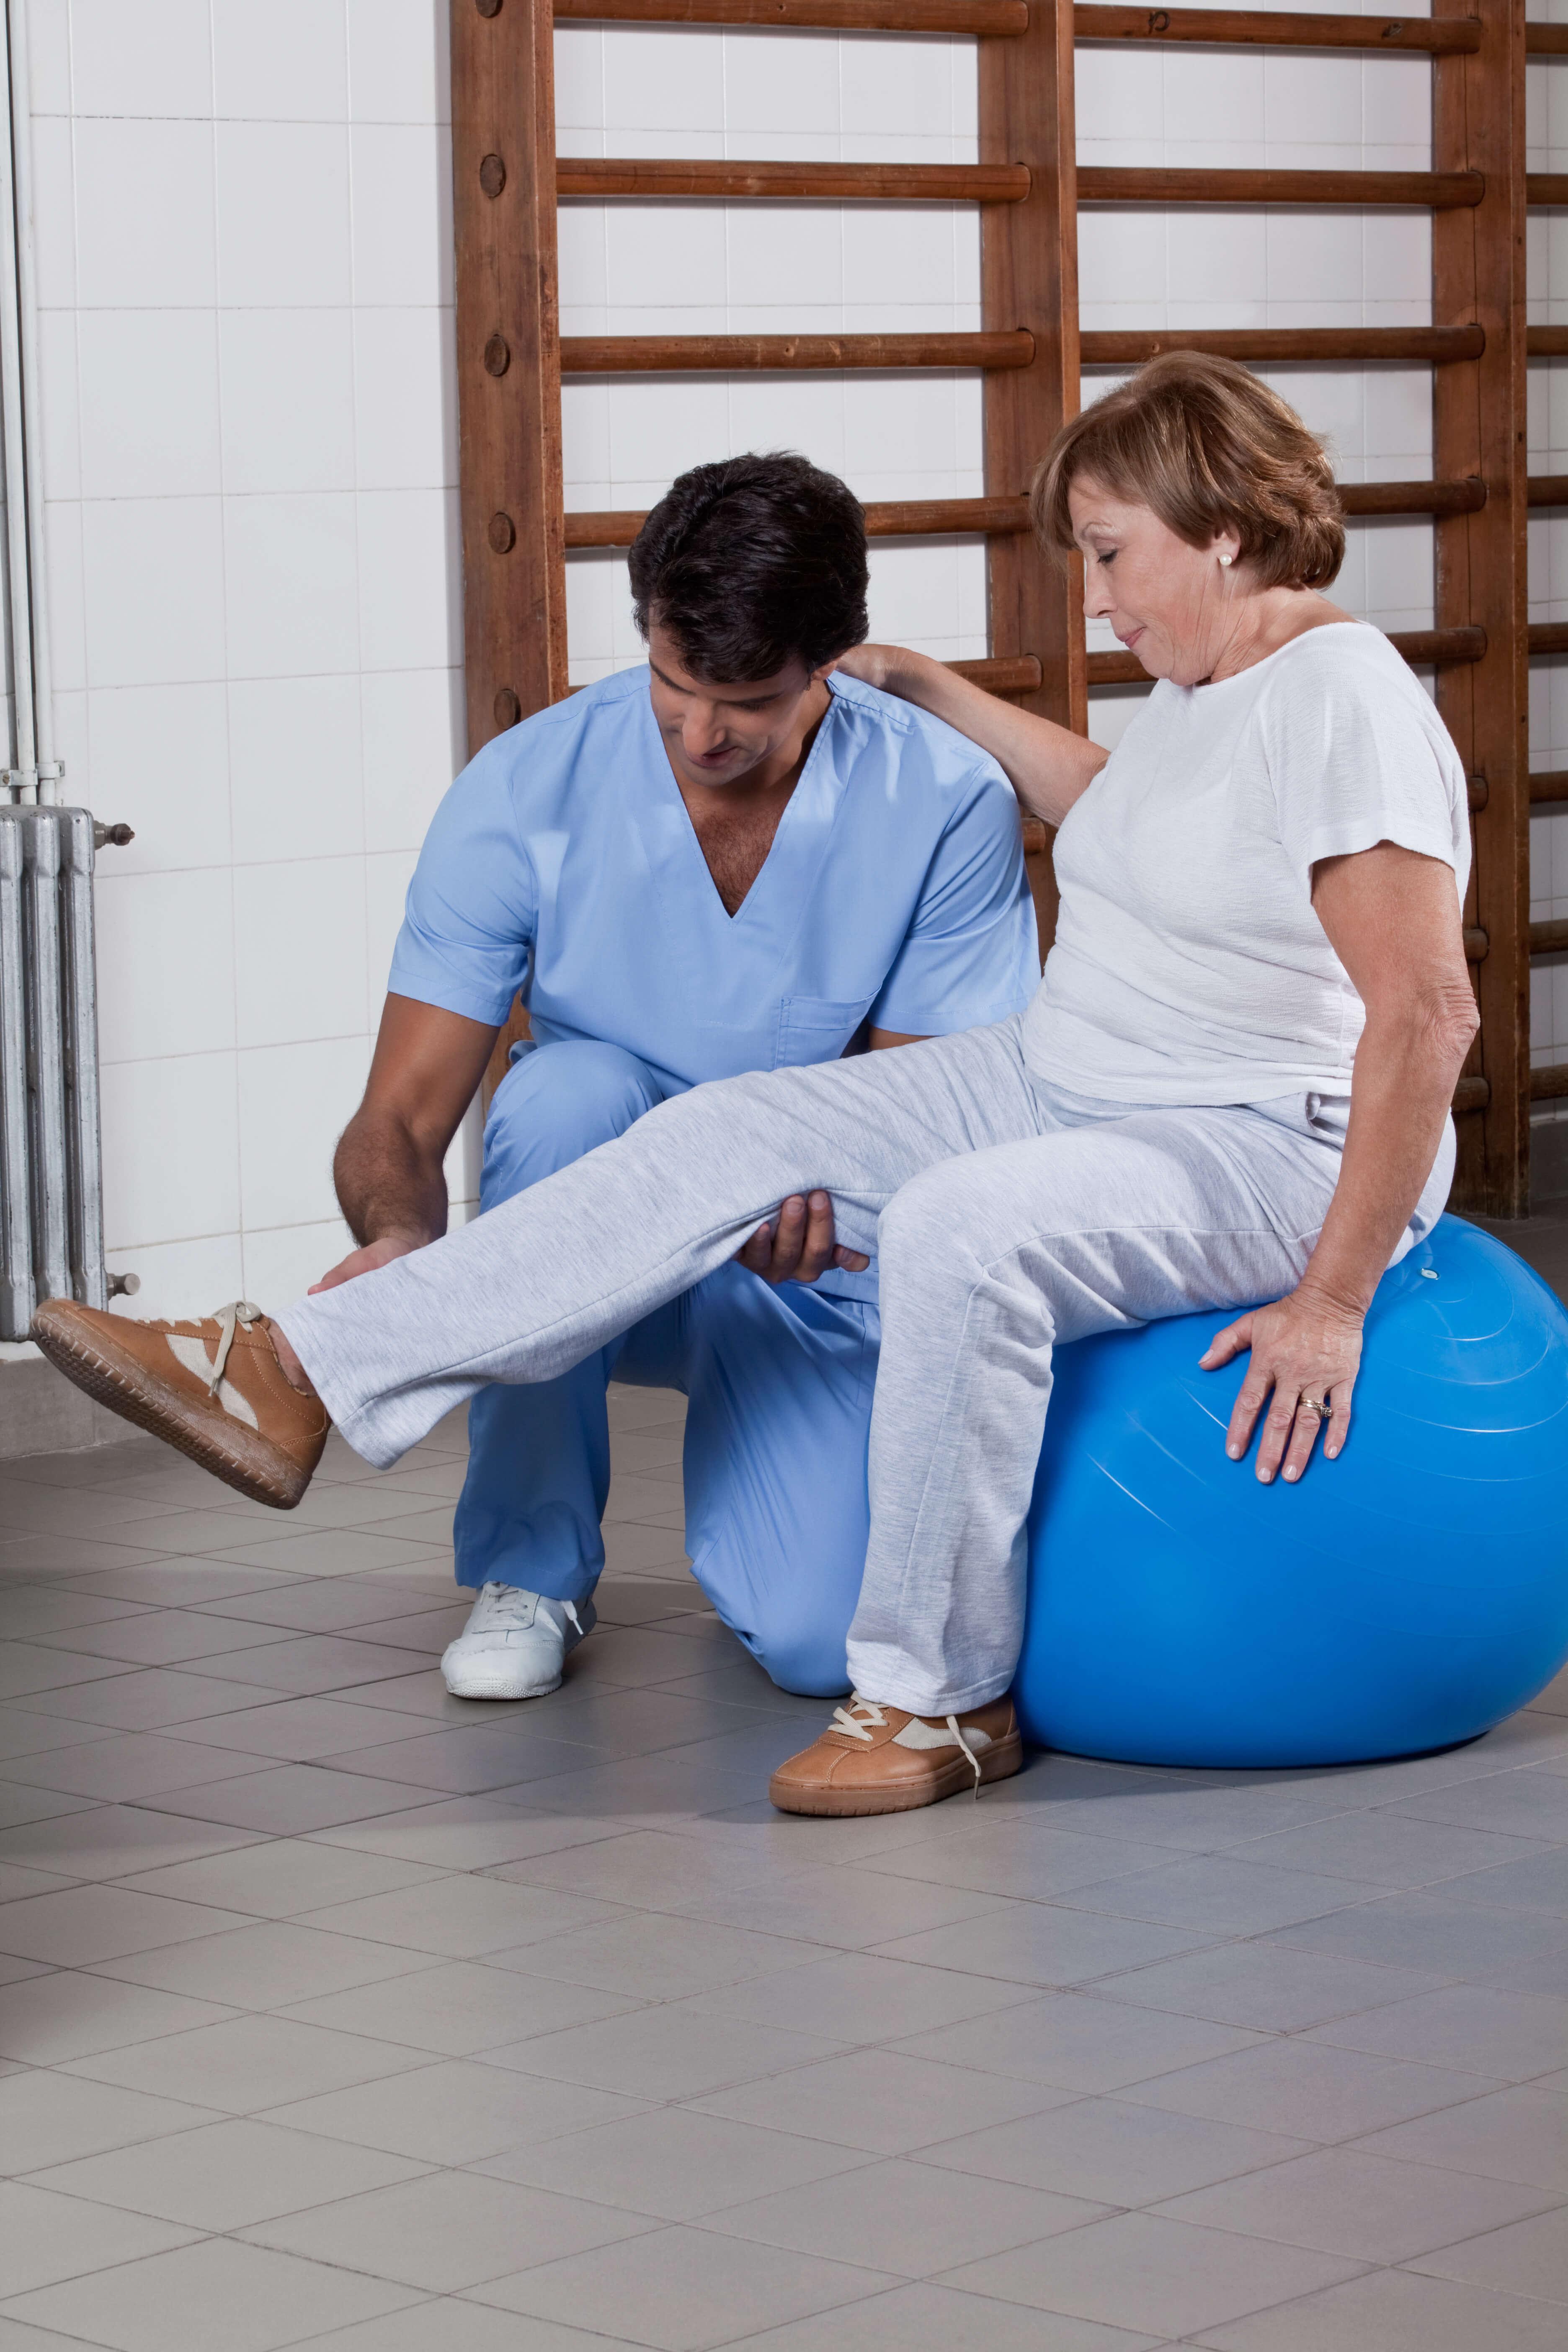 Physical therapy Battle Creek, Kalamazoo, Mattawan, Plainwell & Portage, MI